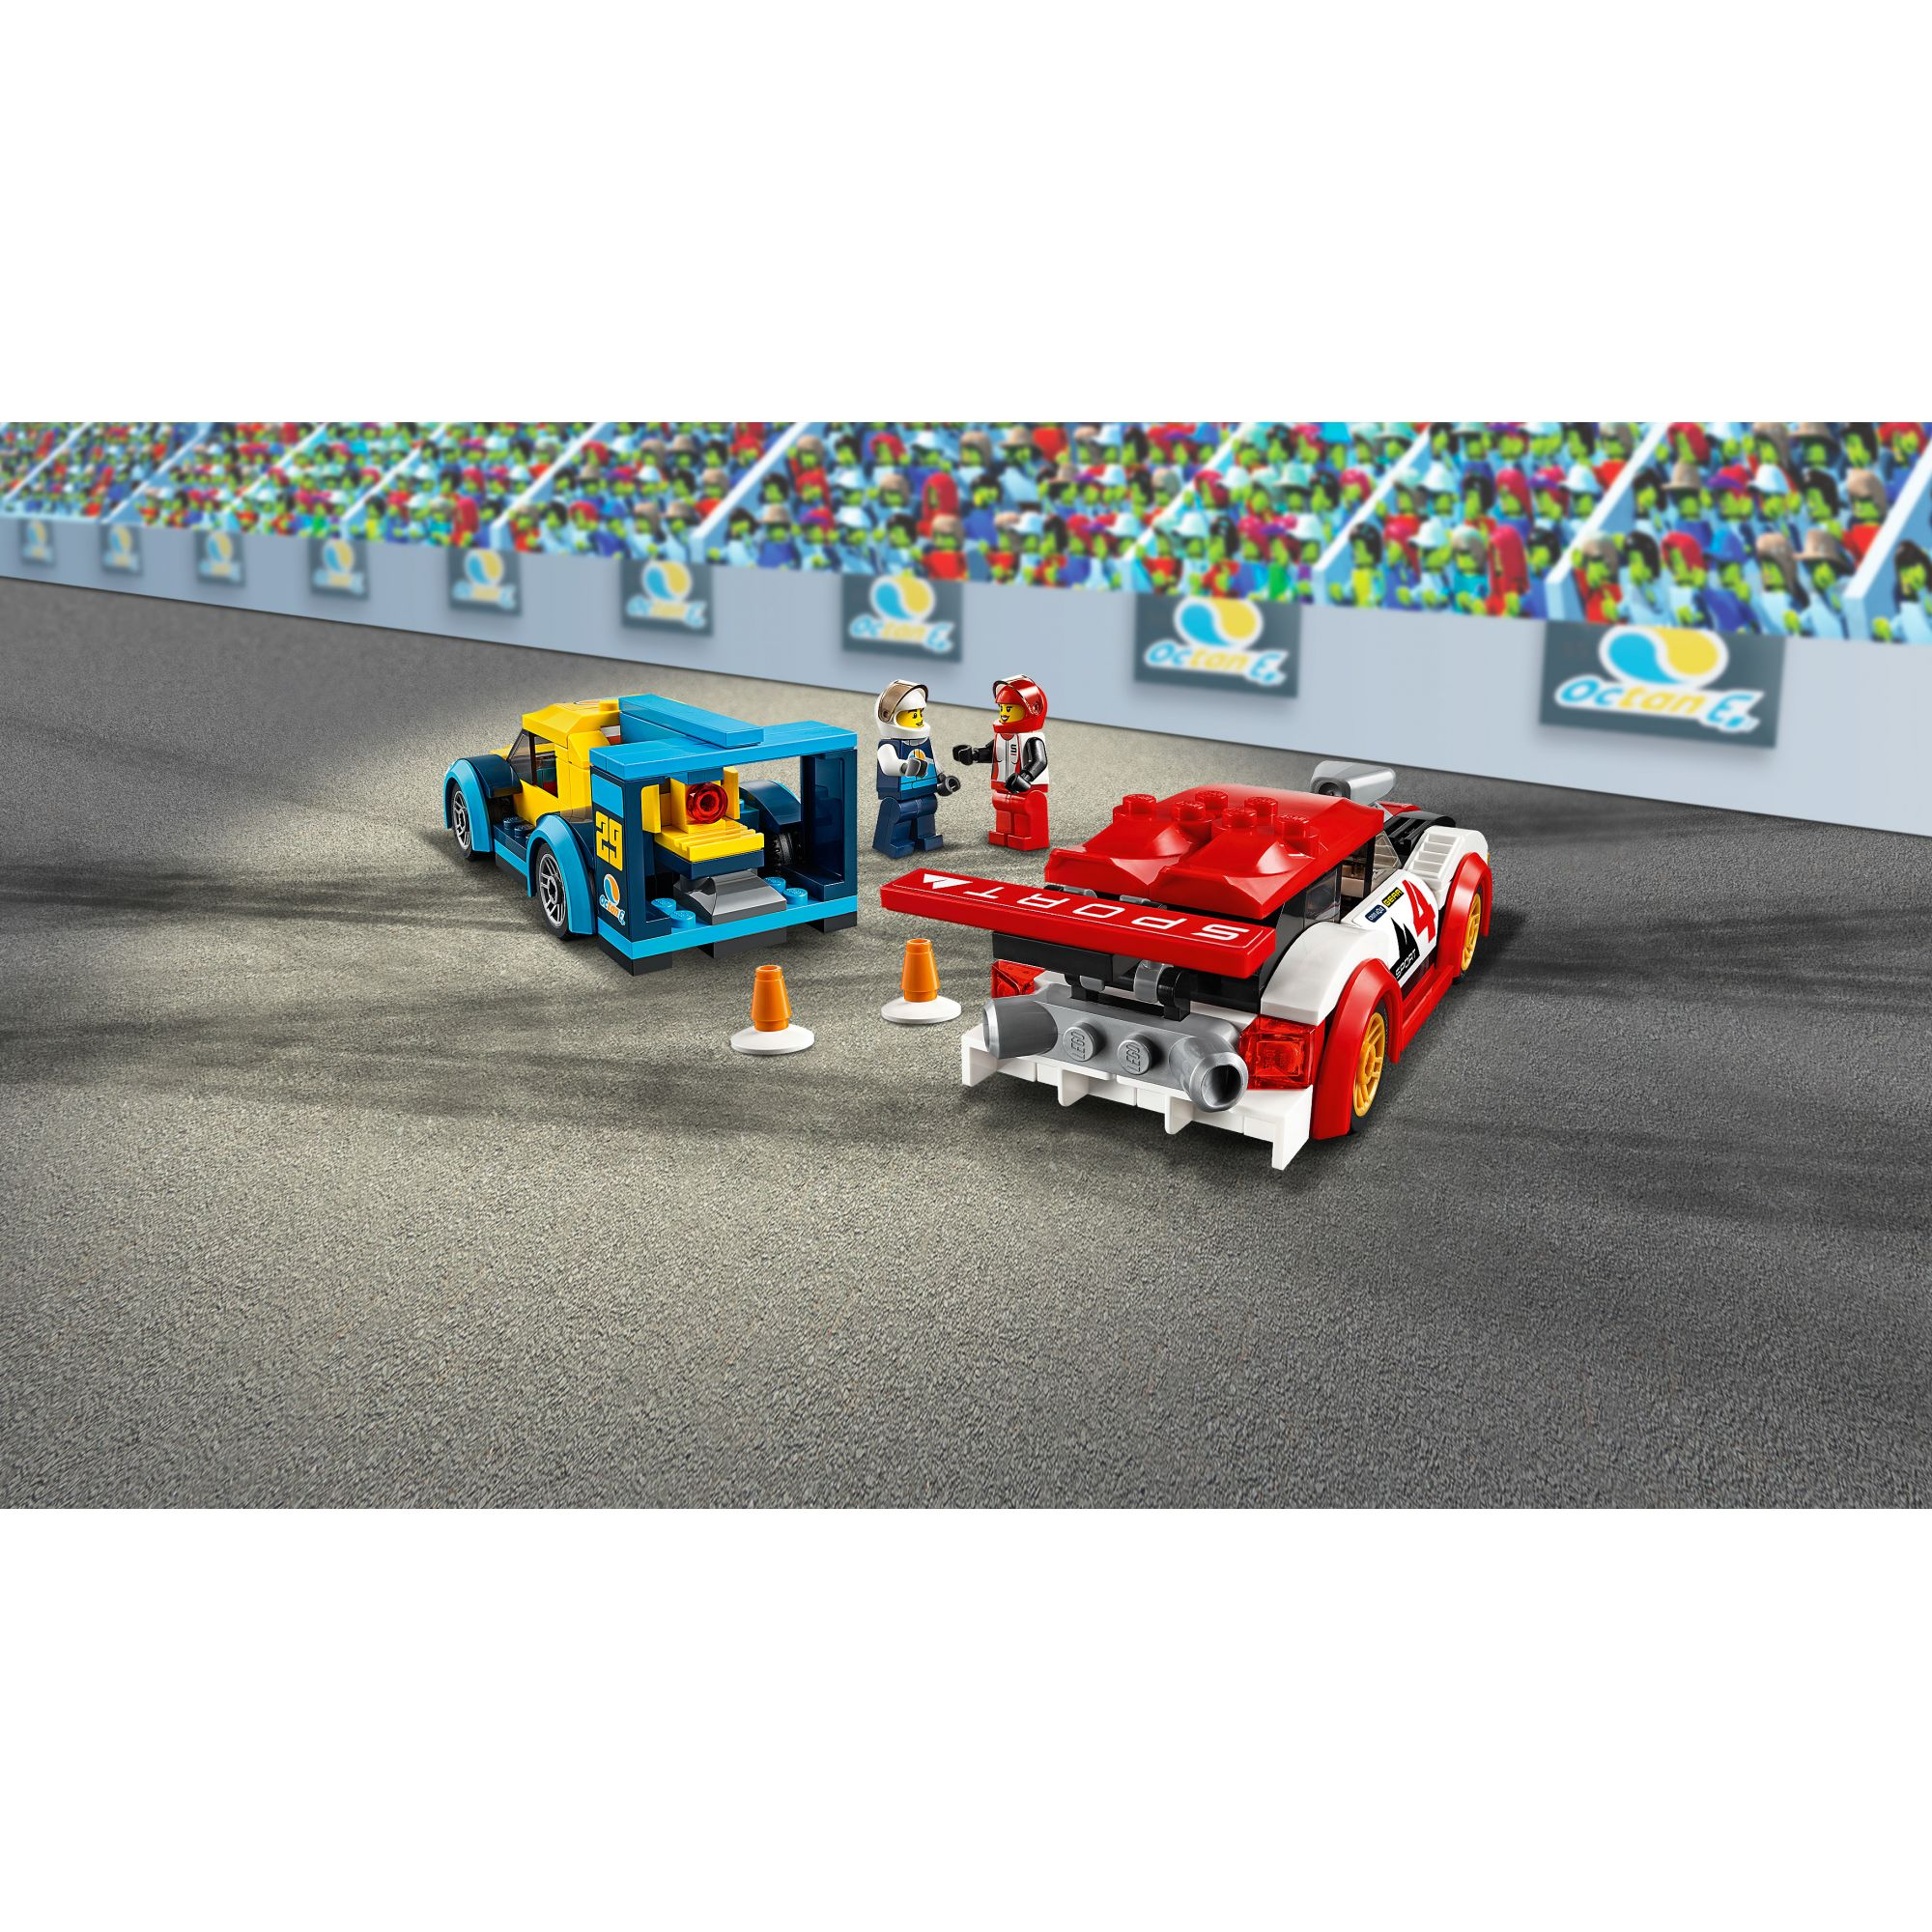 LEGO CITY   LEGO City Auto da corsa - 60256